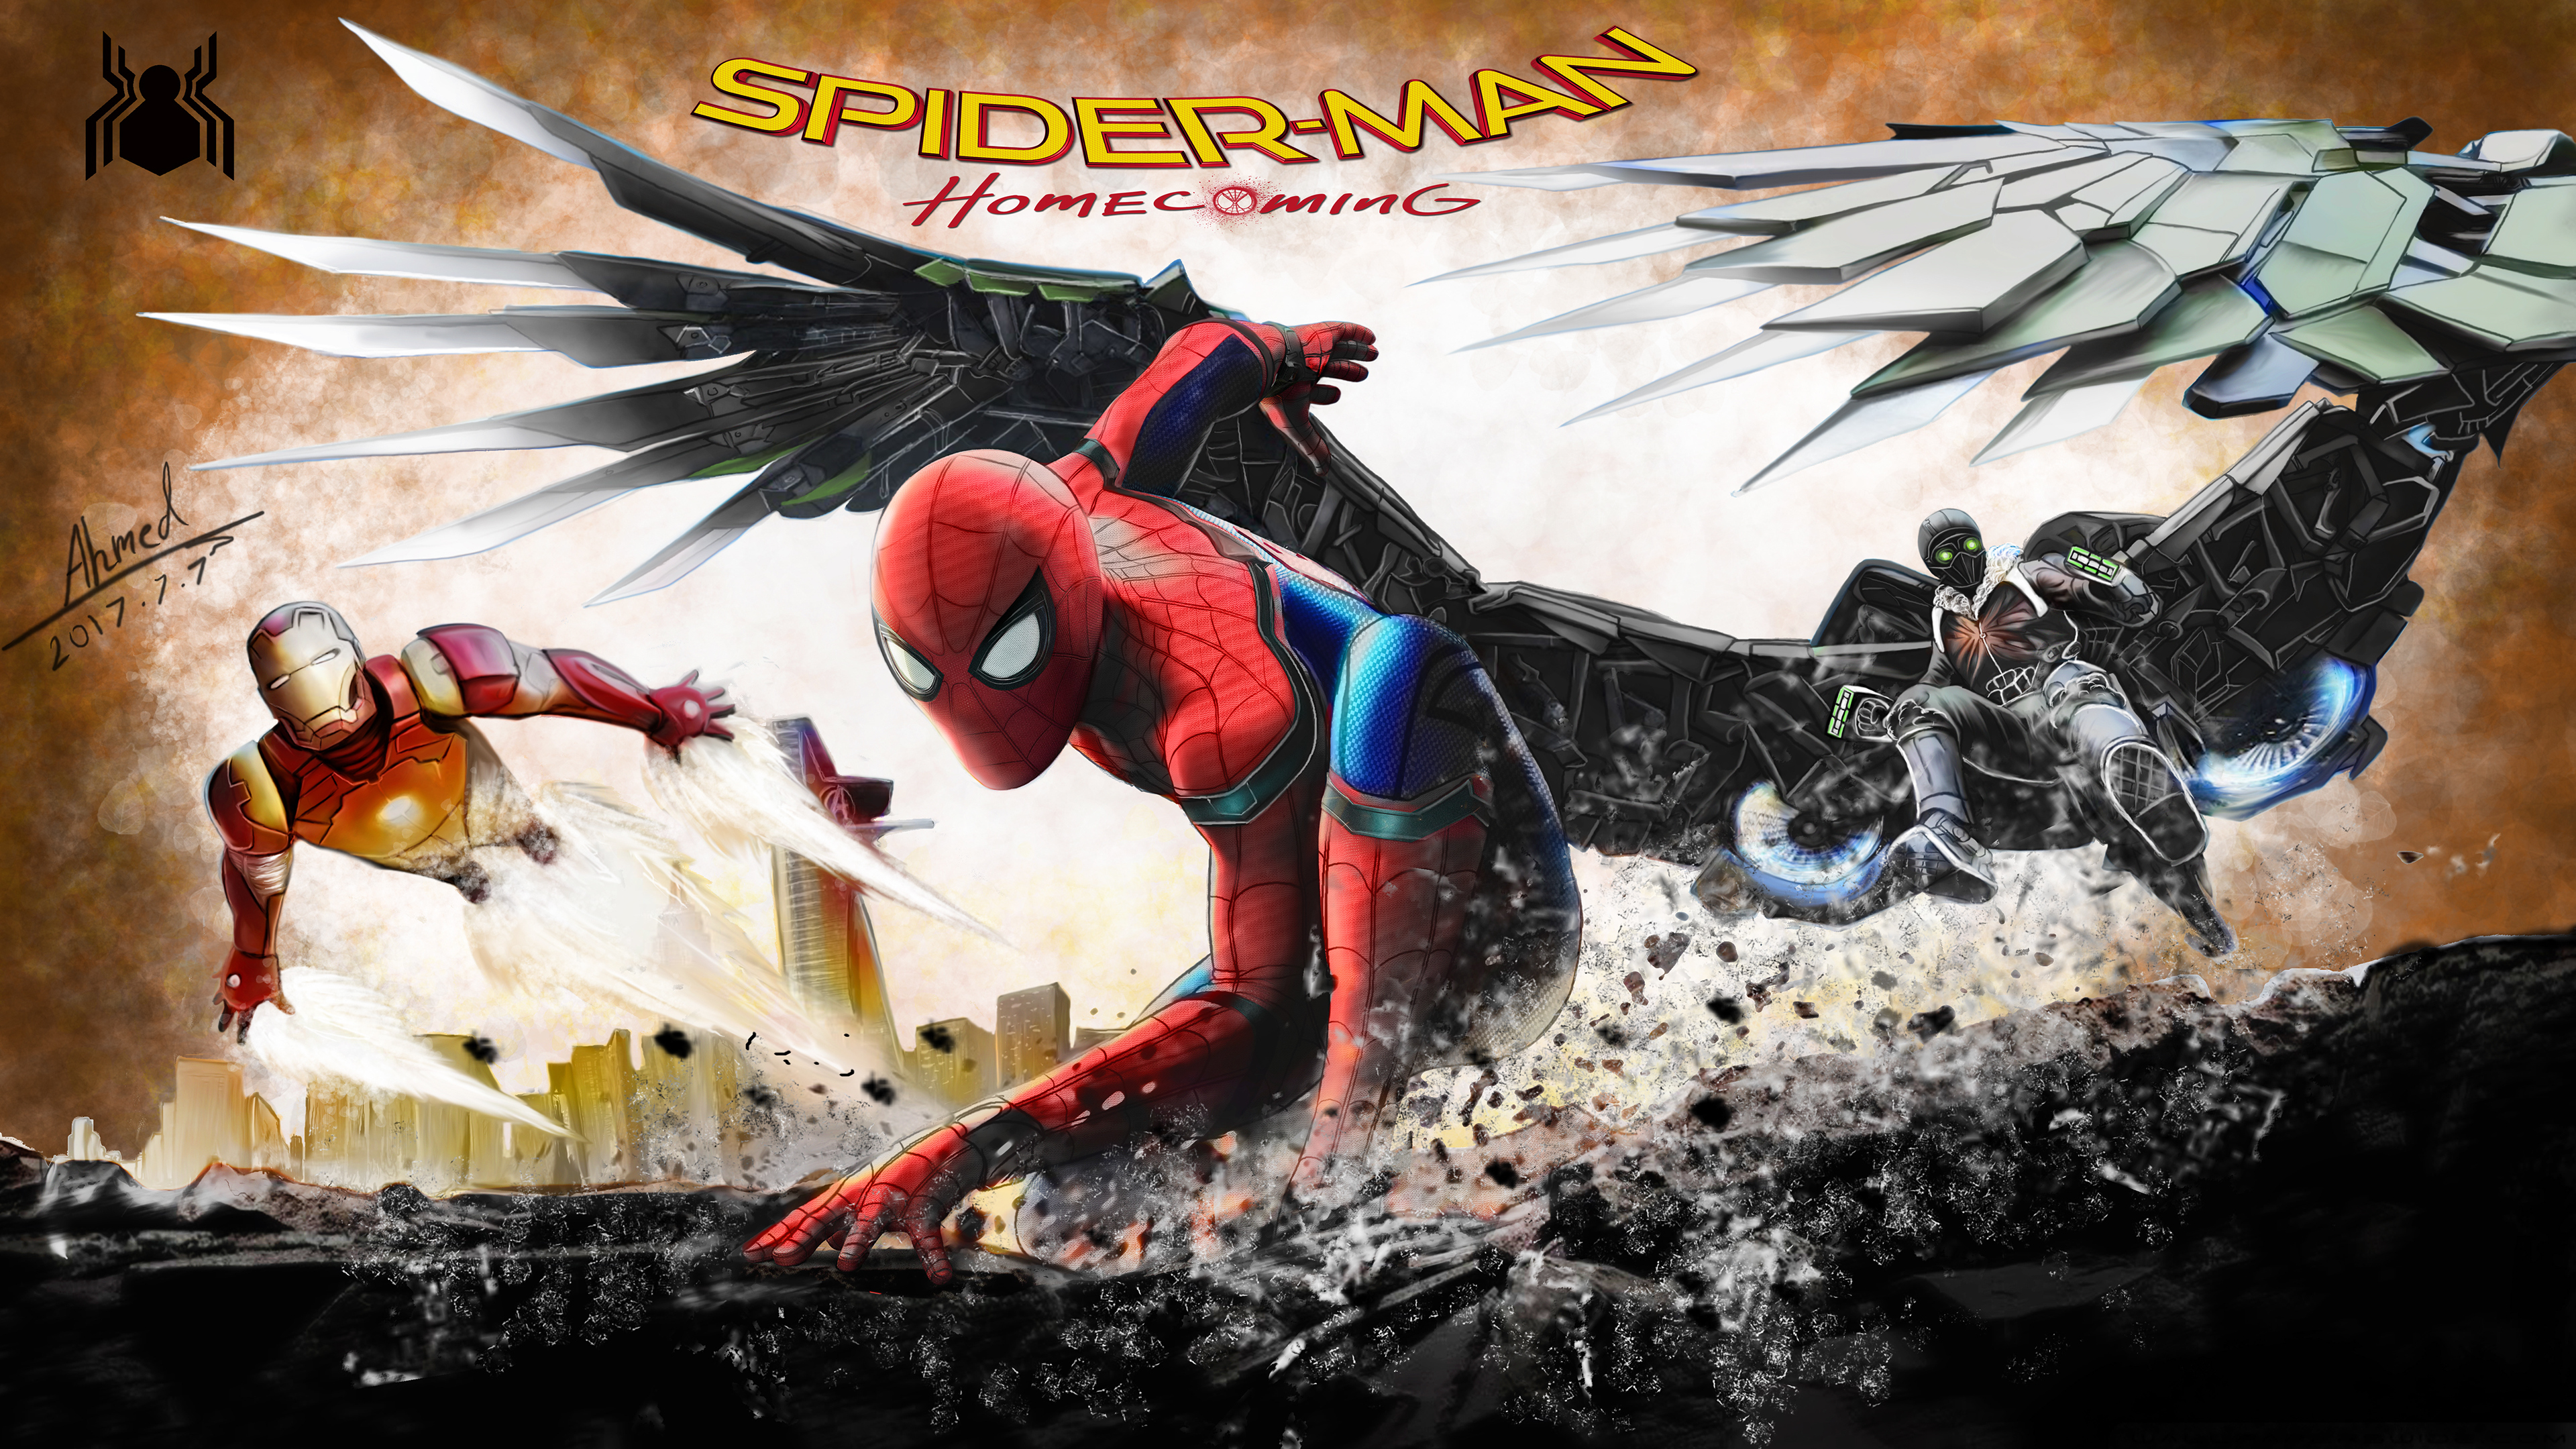 spiderman-homecoming-tom-holland-4k-pw.jpg